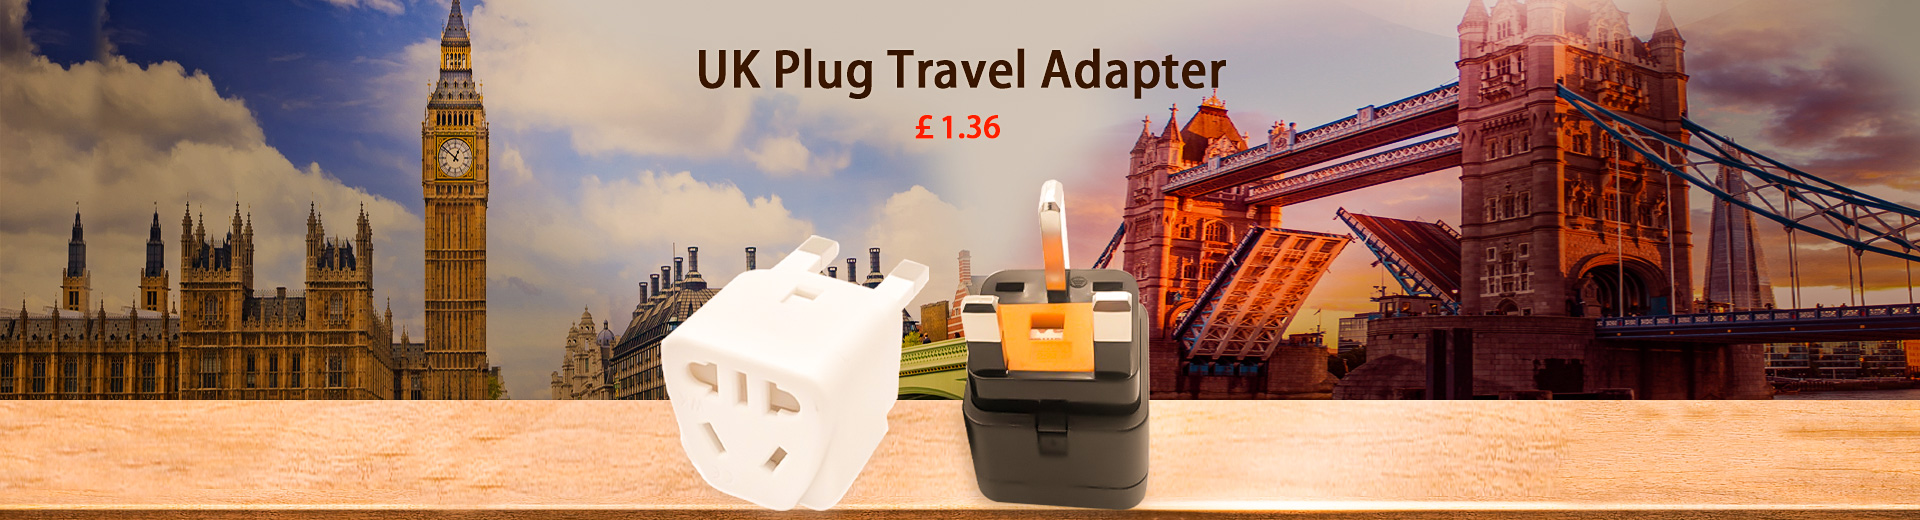 UK Plug Travel Adapter